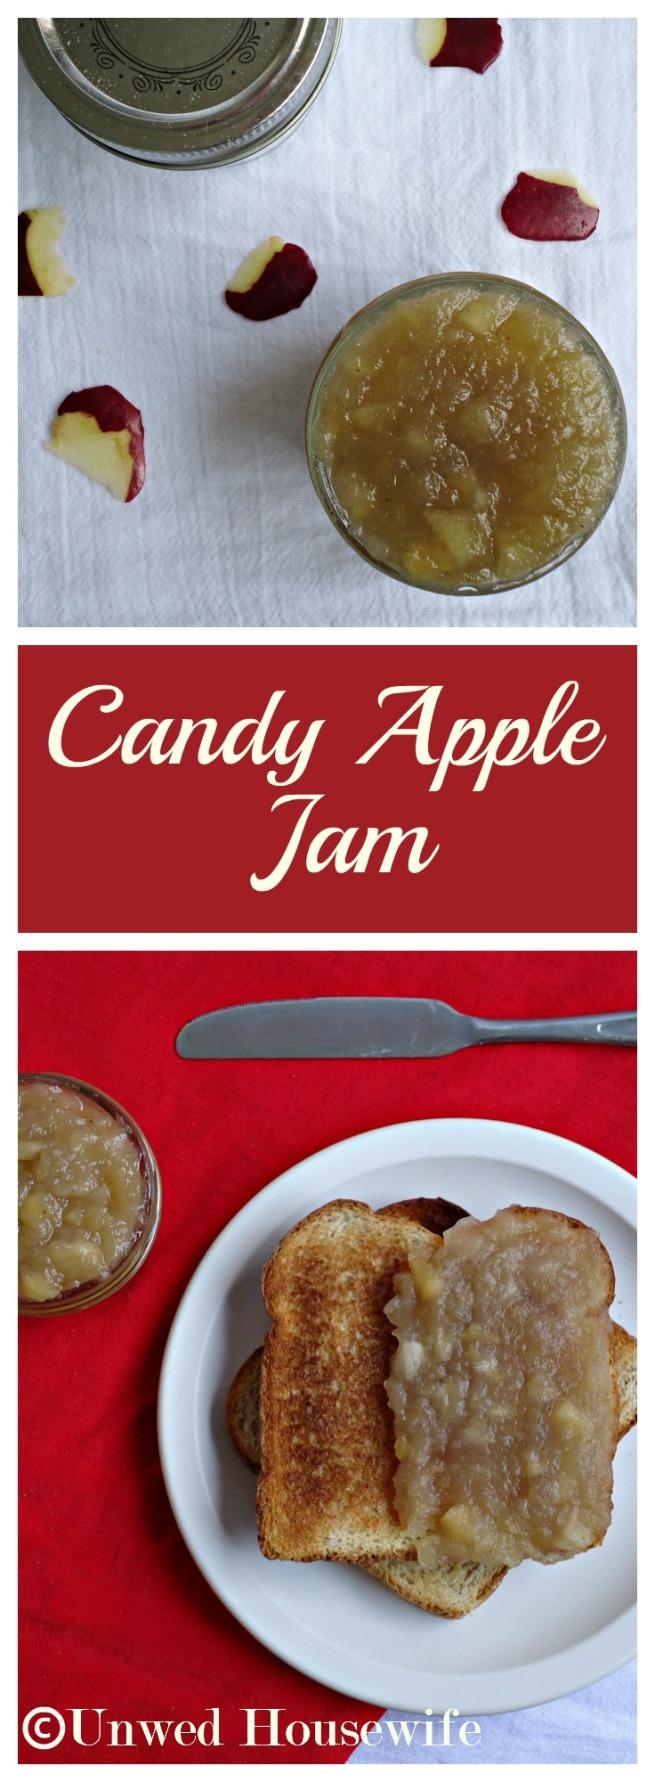 Candy Apple Jam Pinterest